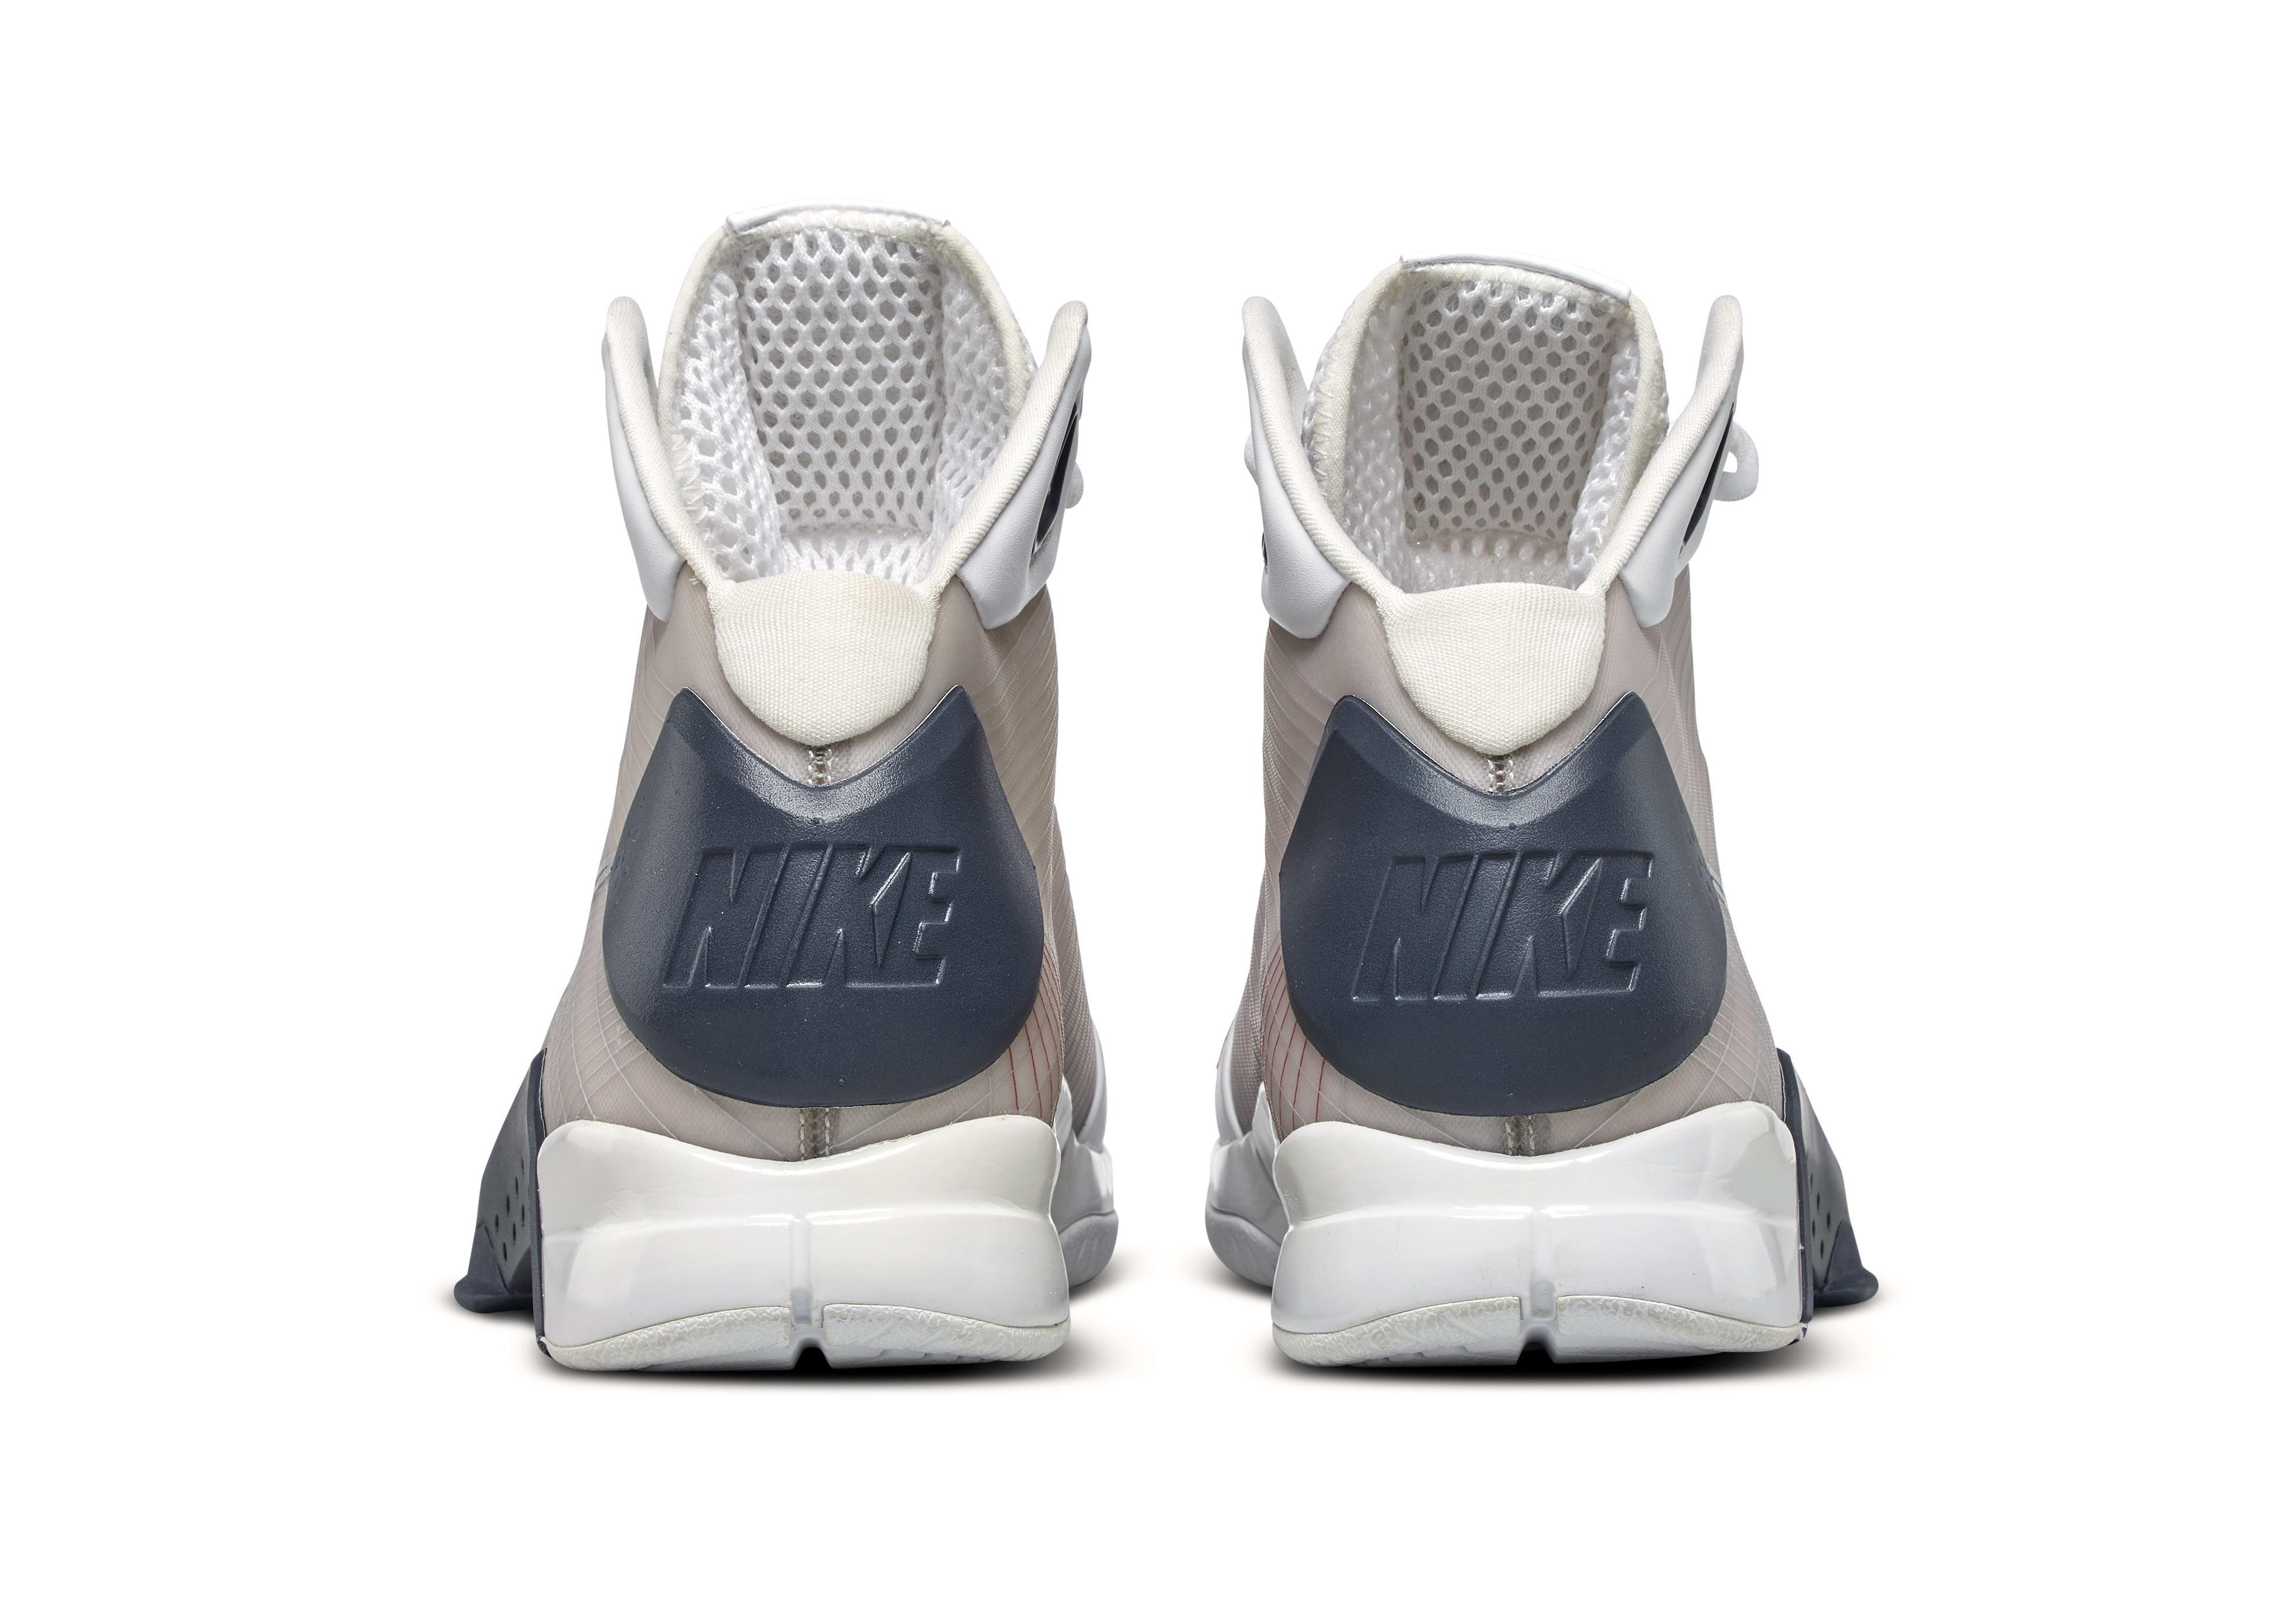 Nike Hyperdunk 'Barack Obama' PE Heel